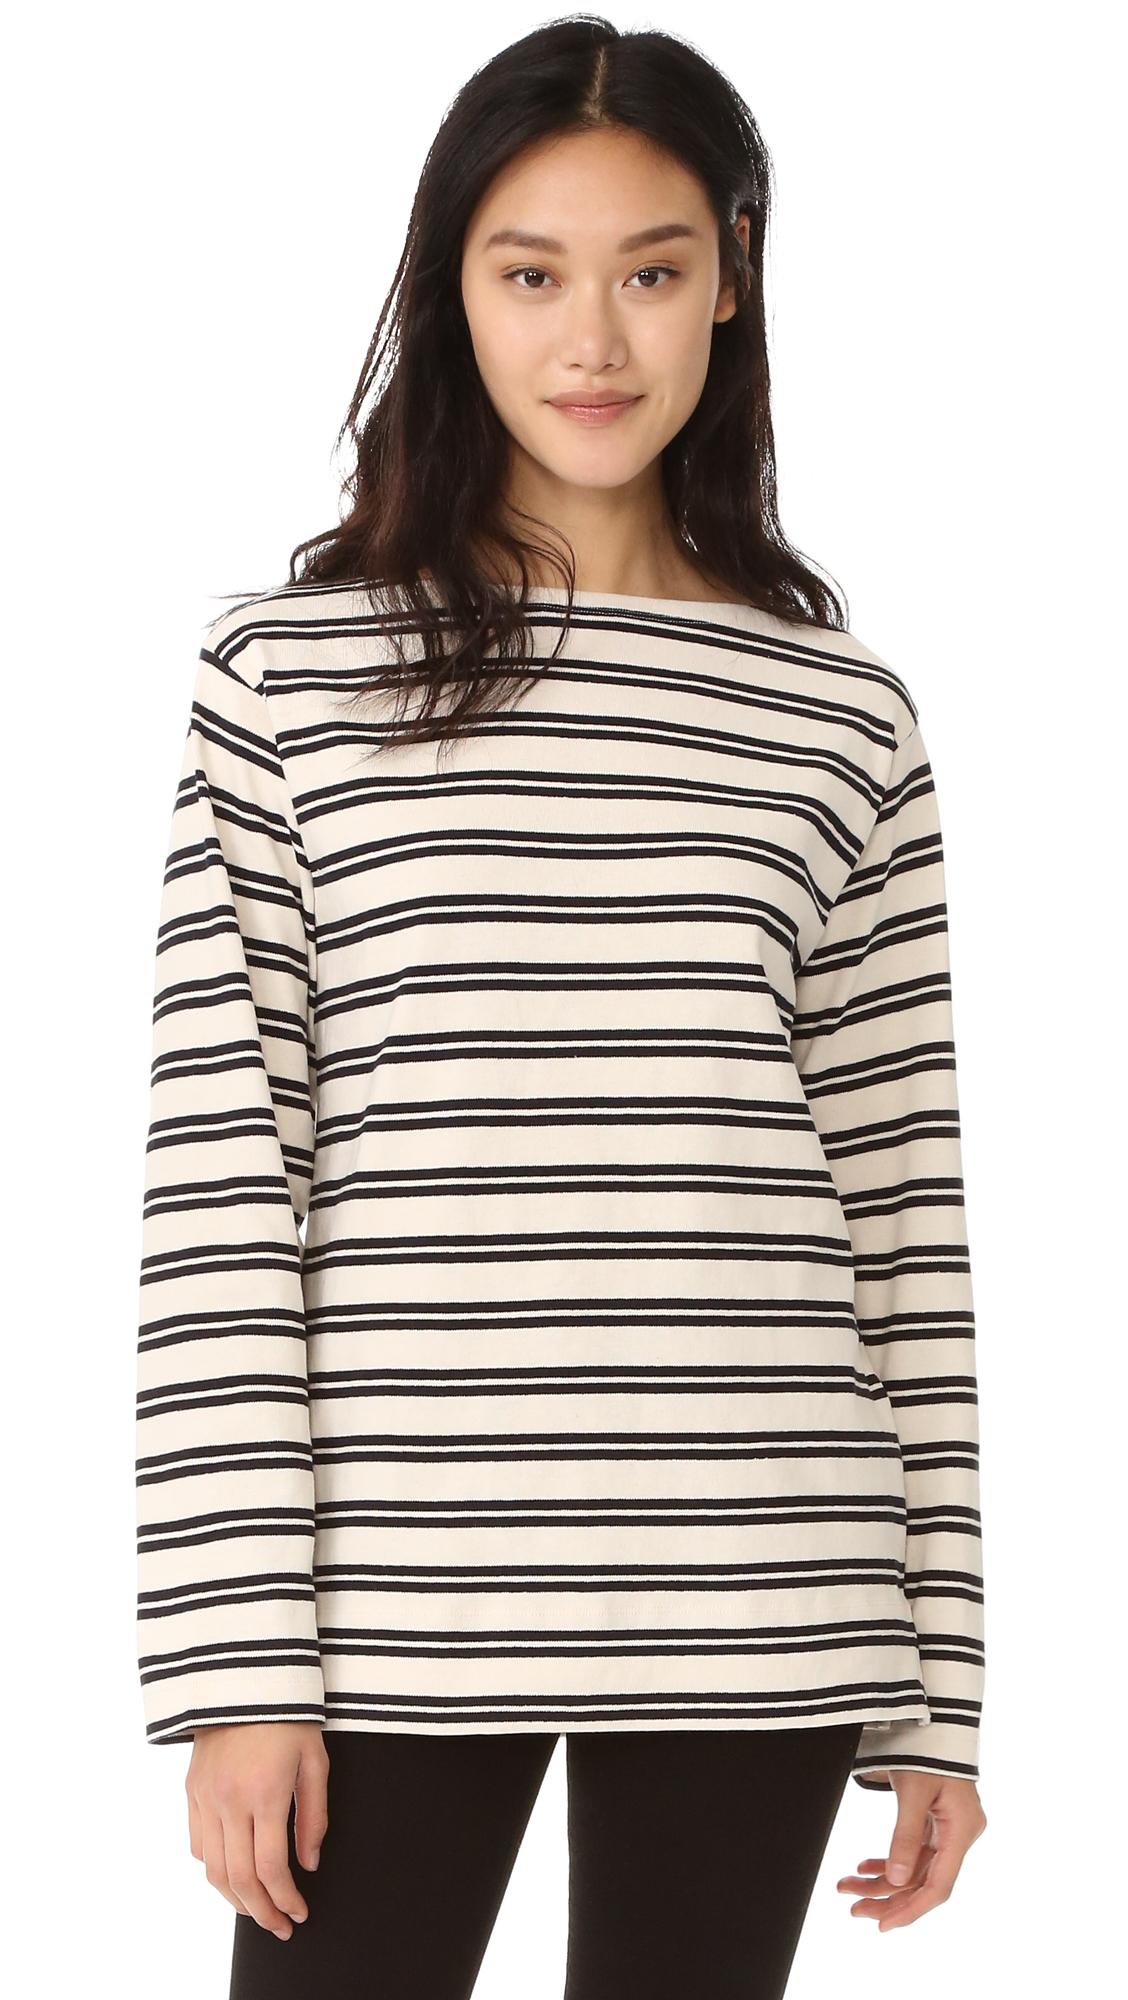 Acne Studios Davana Stripes Sweater - Ecru White/Navy at Shopbop